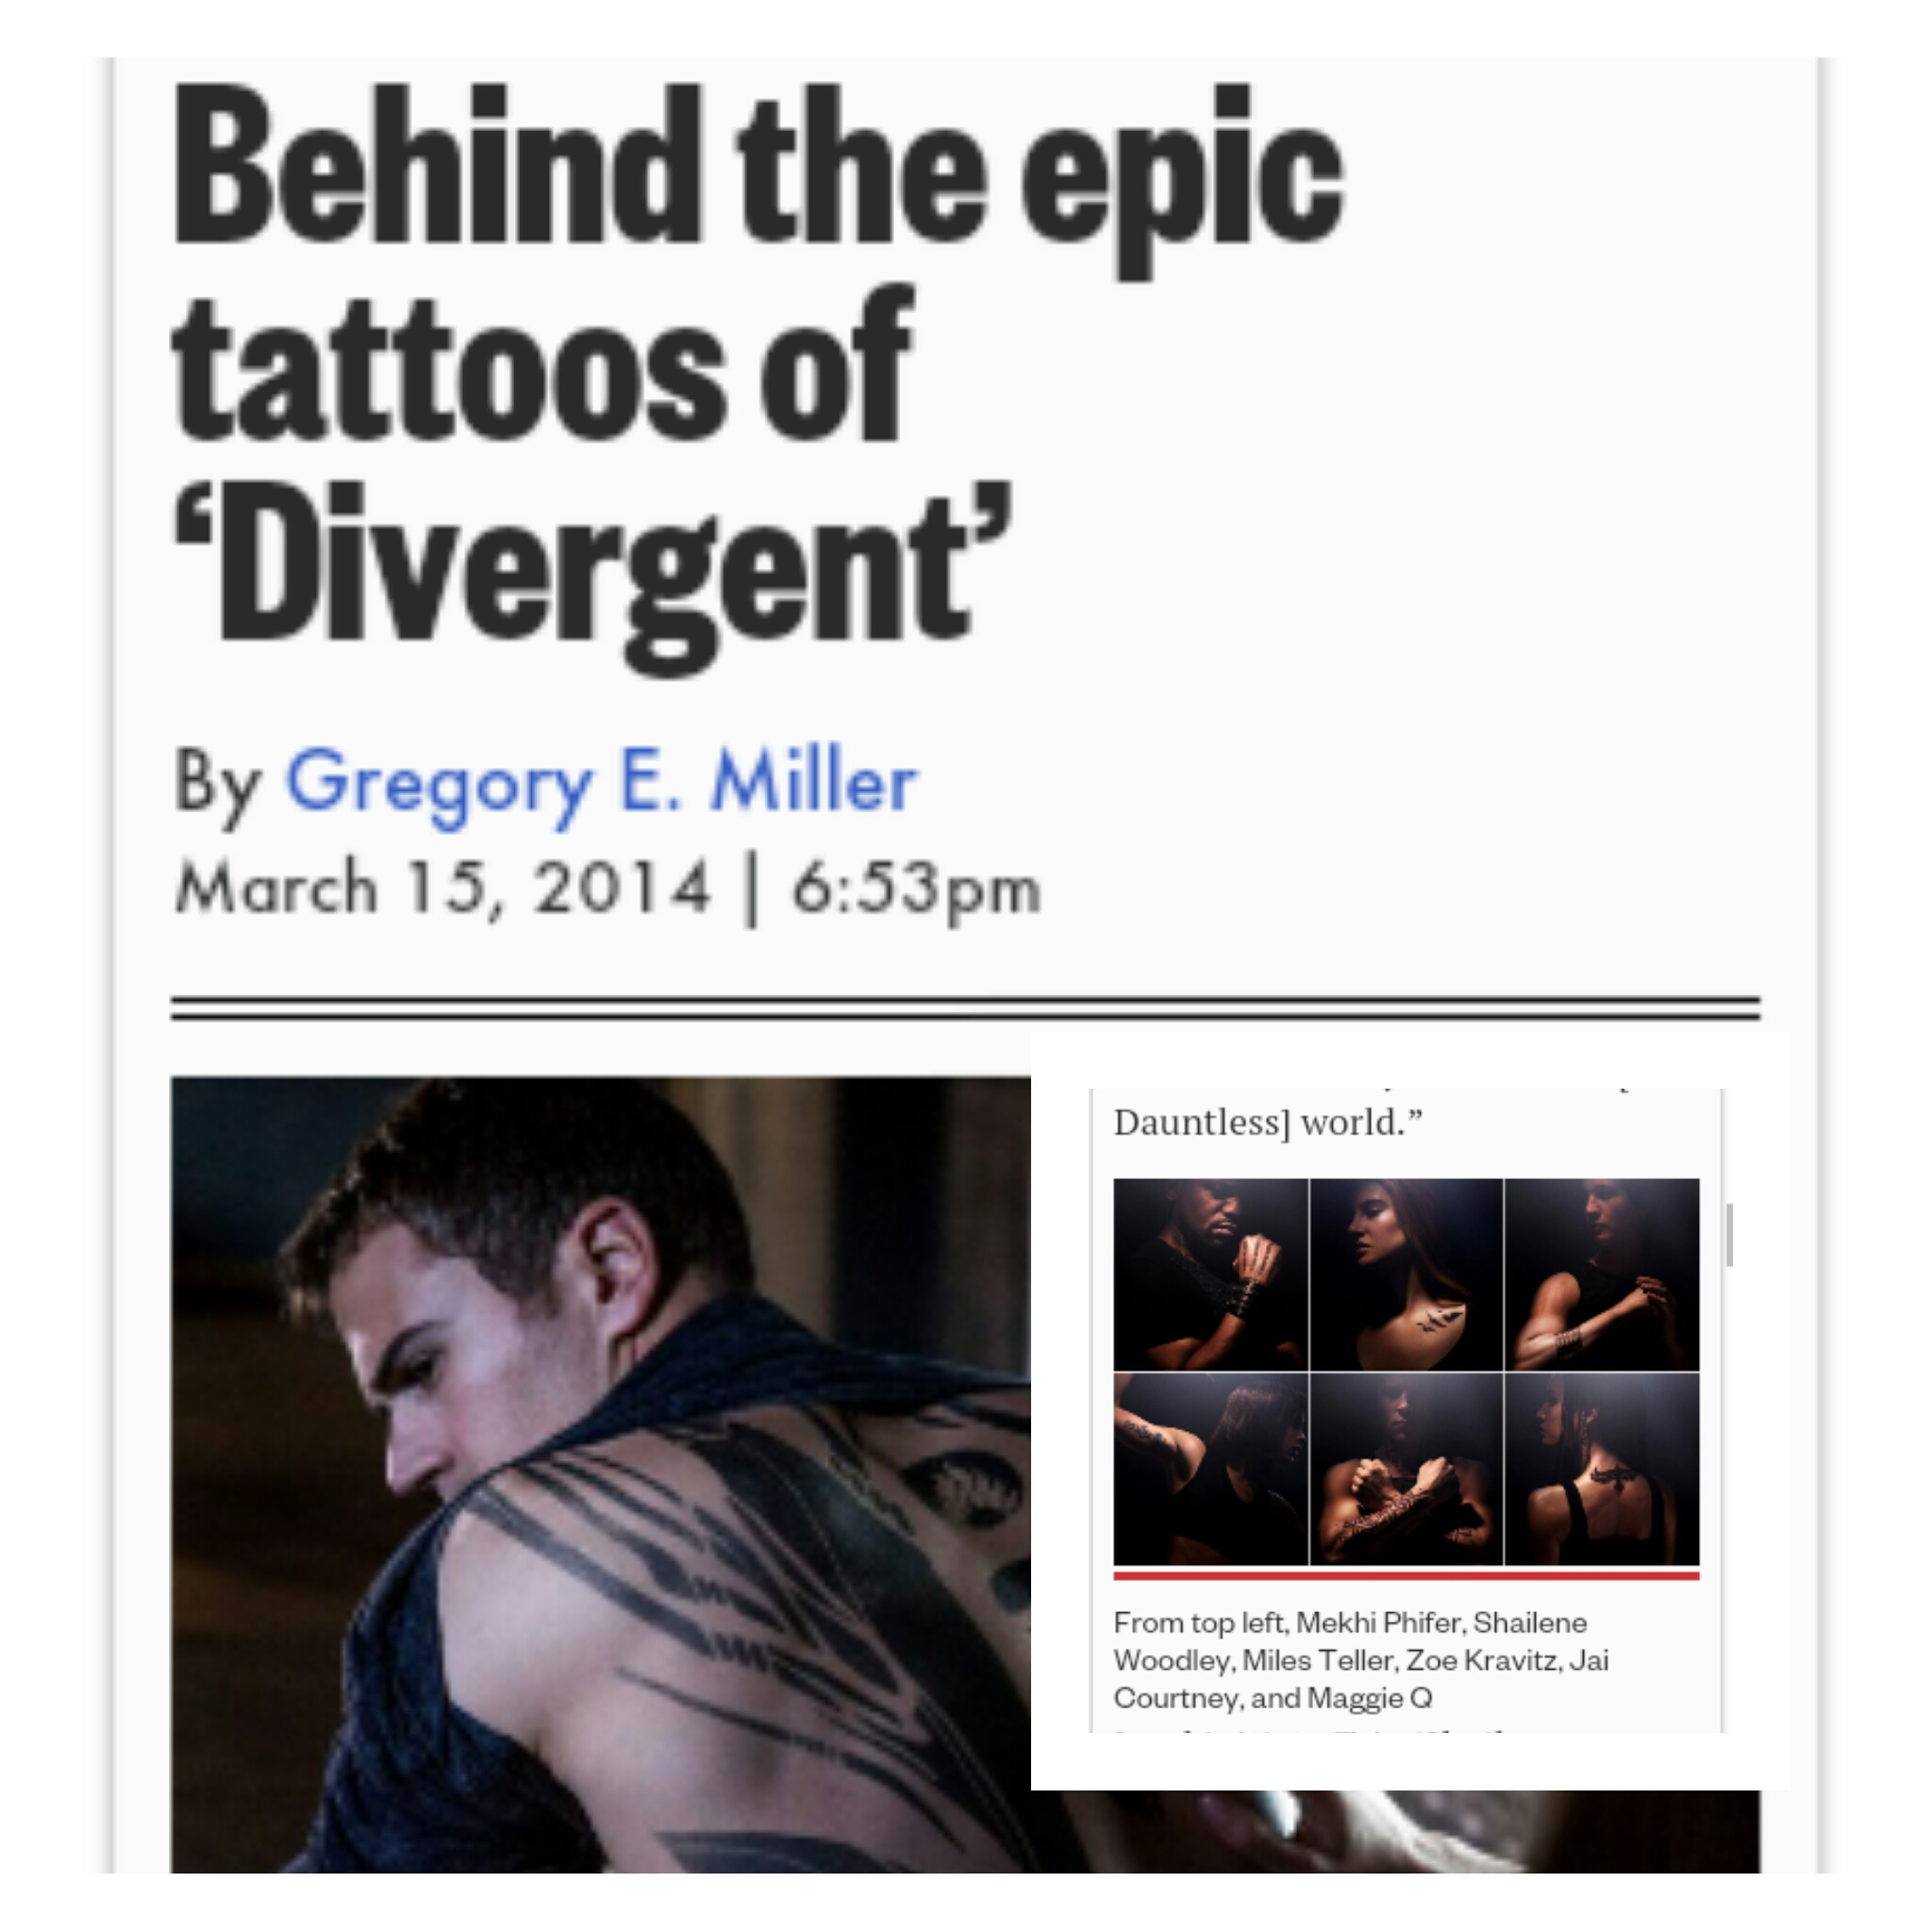 Dauntless Word Tattoo